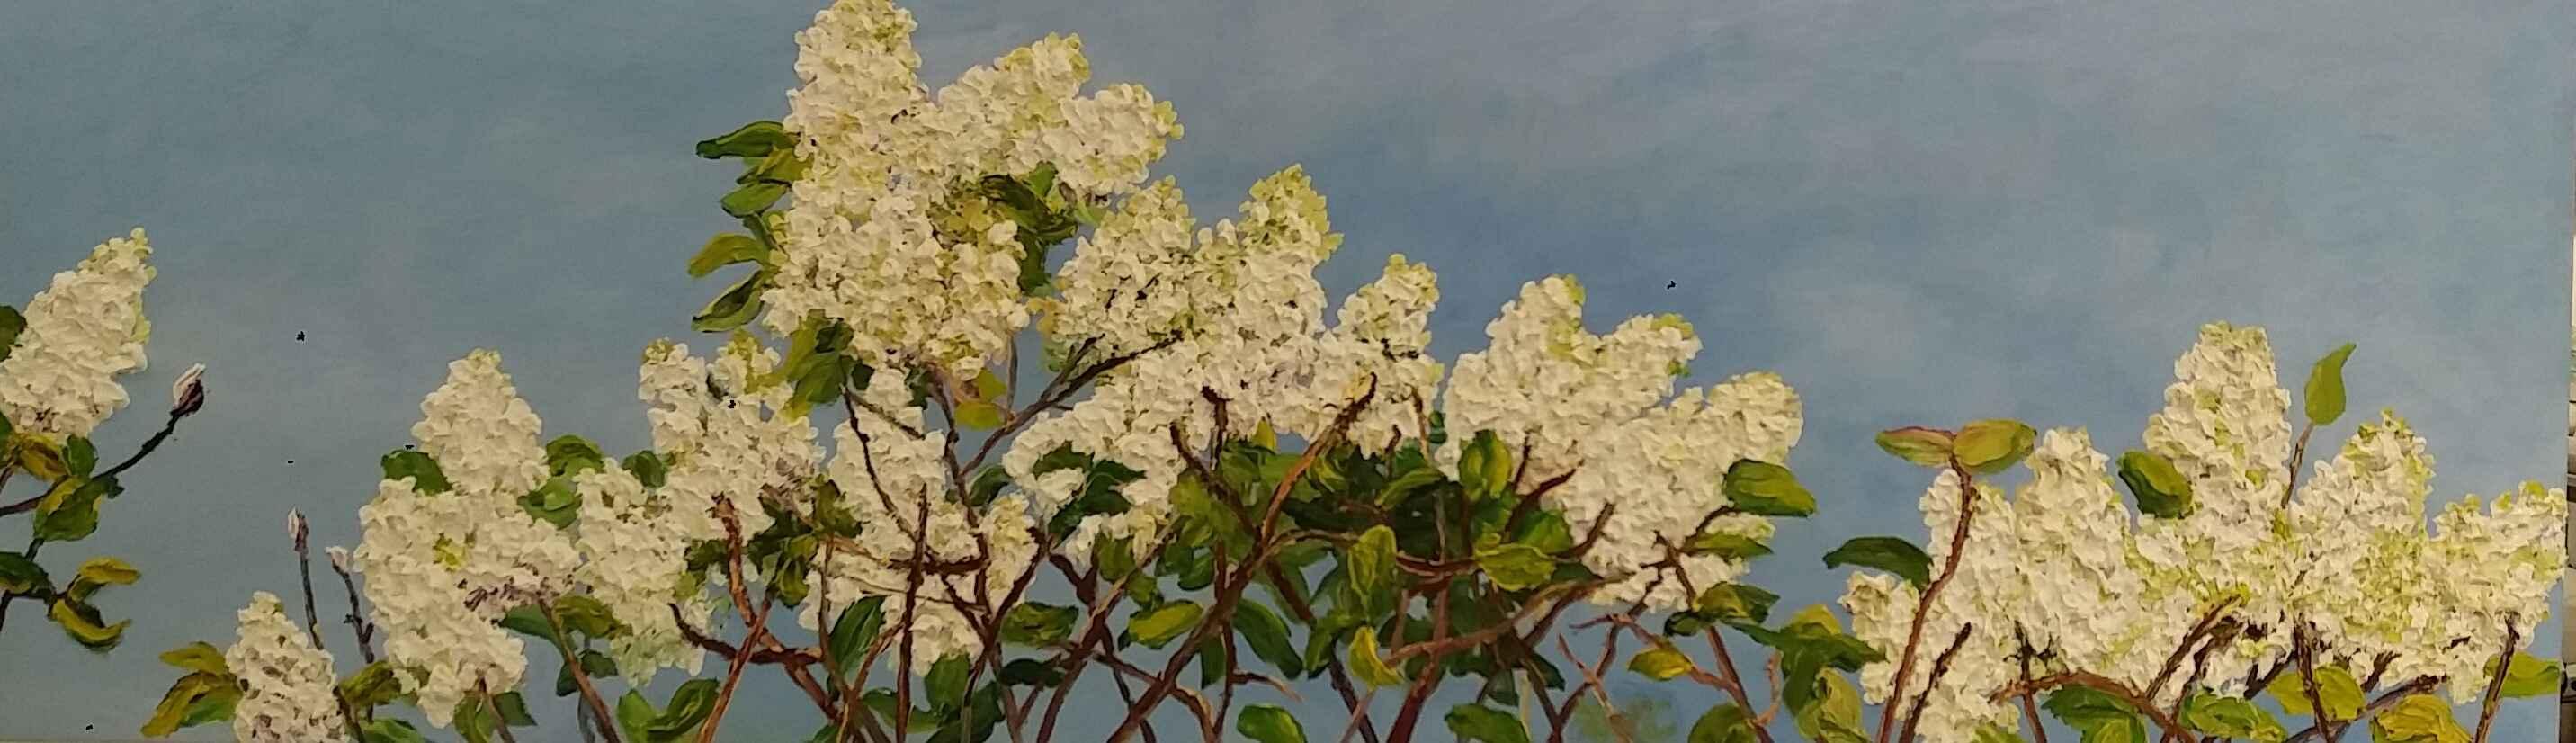 Floating Against the ... by Ms Debra Lynn Carroll - Masterpiece Online